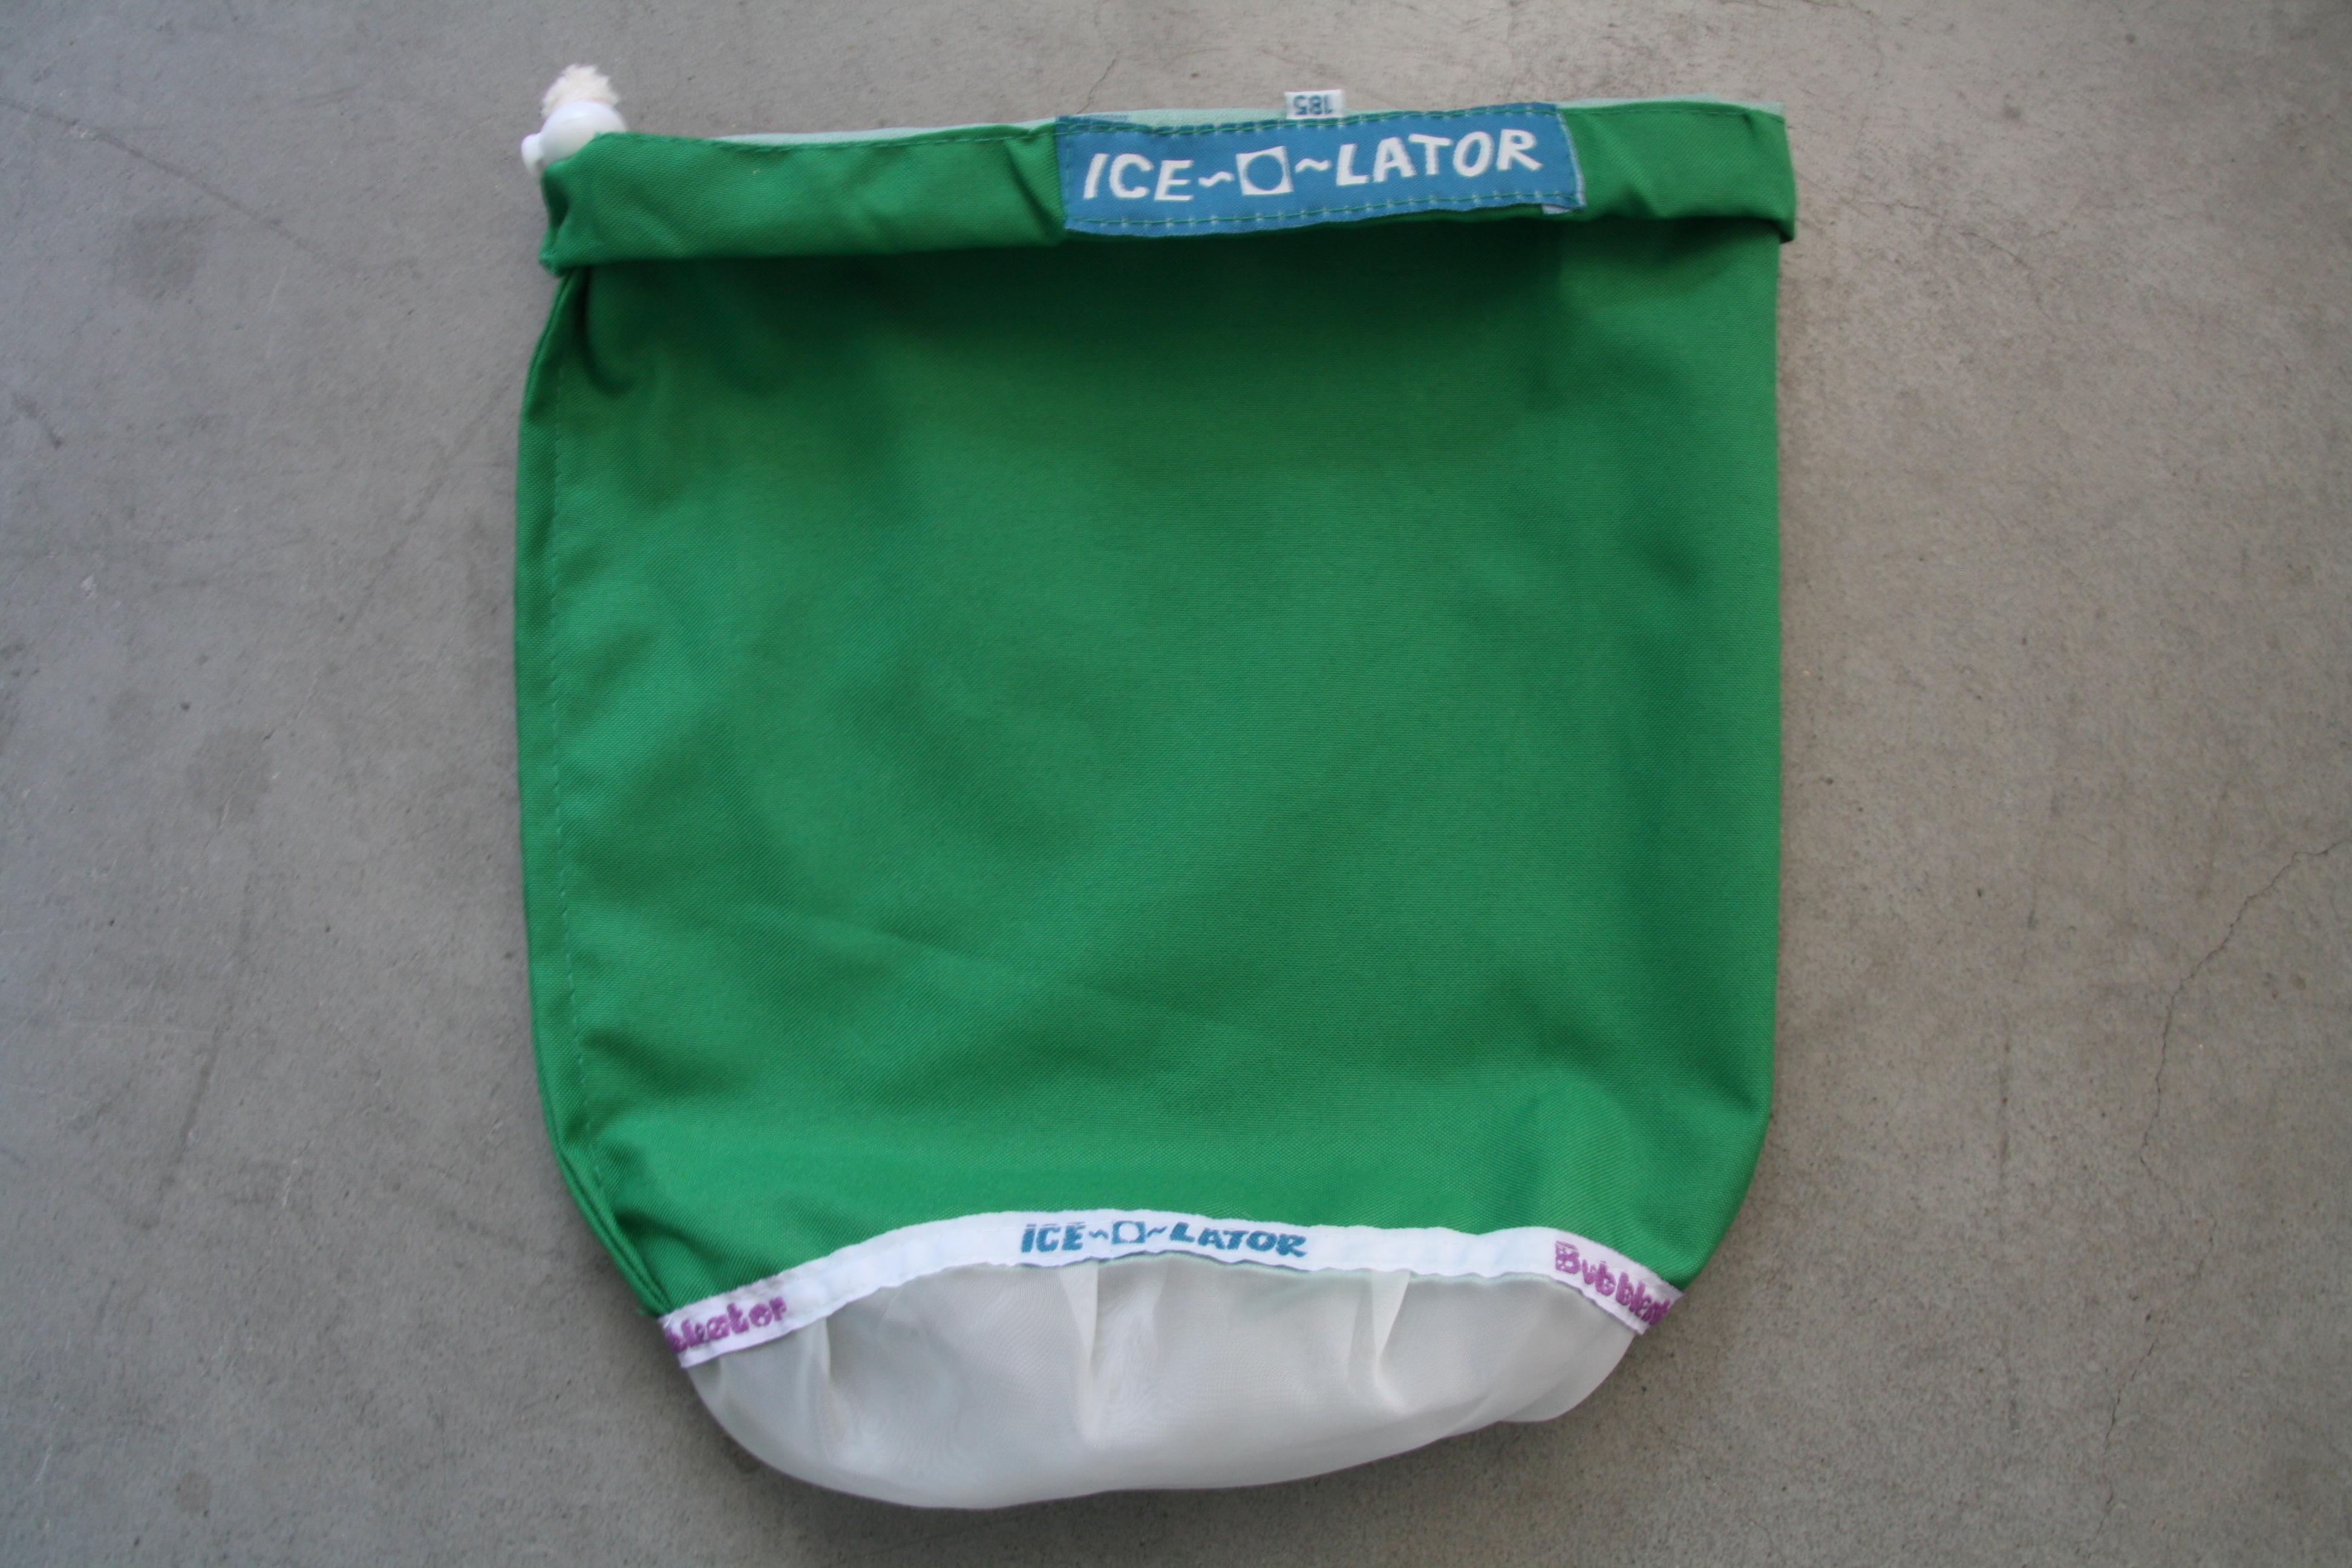 Ice-O-Lator походный Outdoor Set (2 мешка/185-45 микрон)